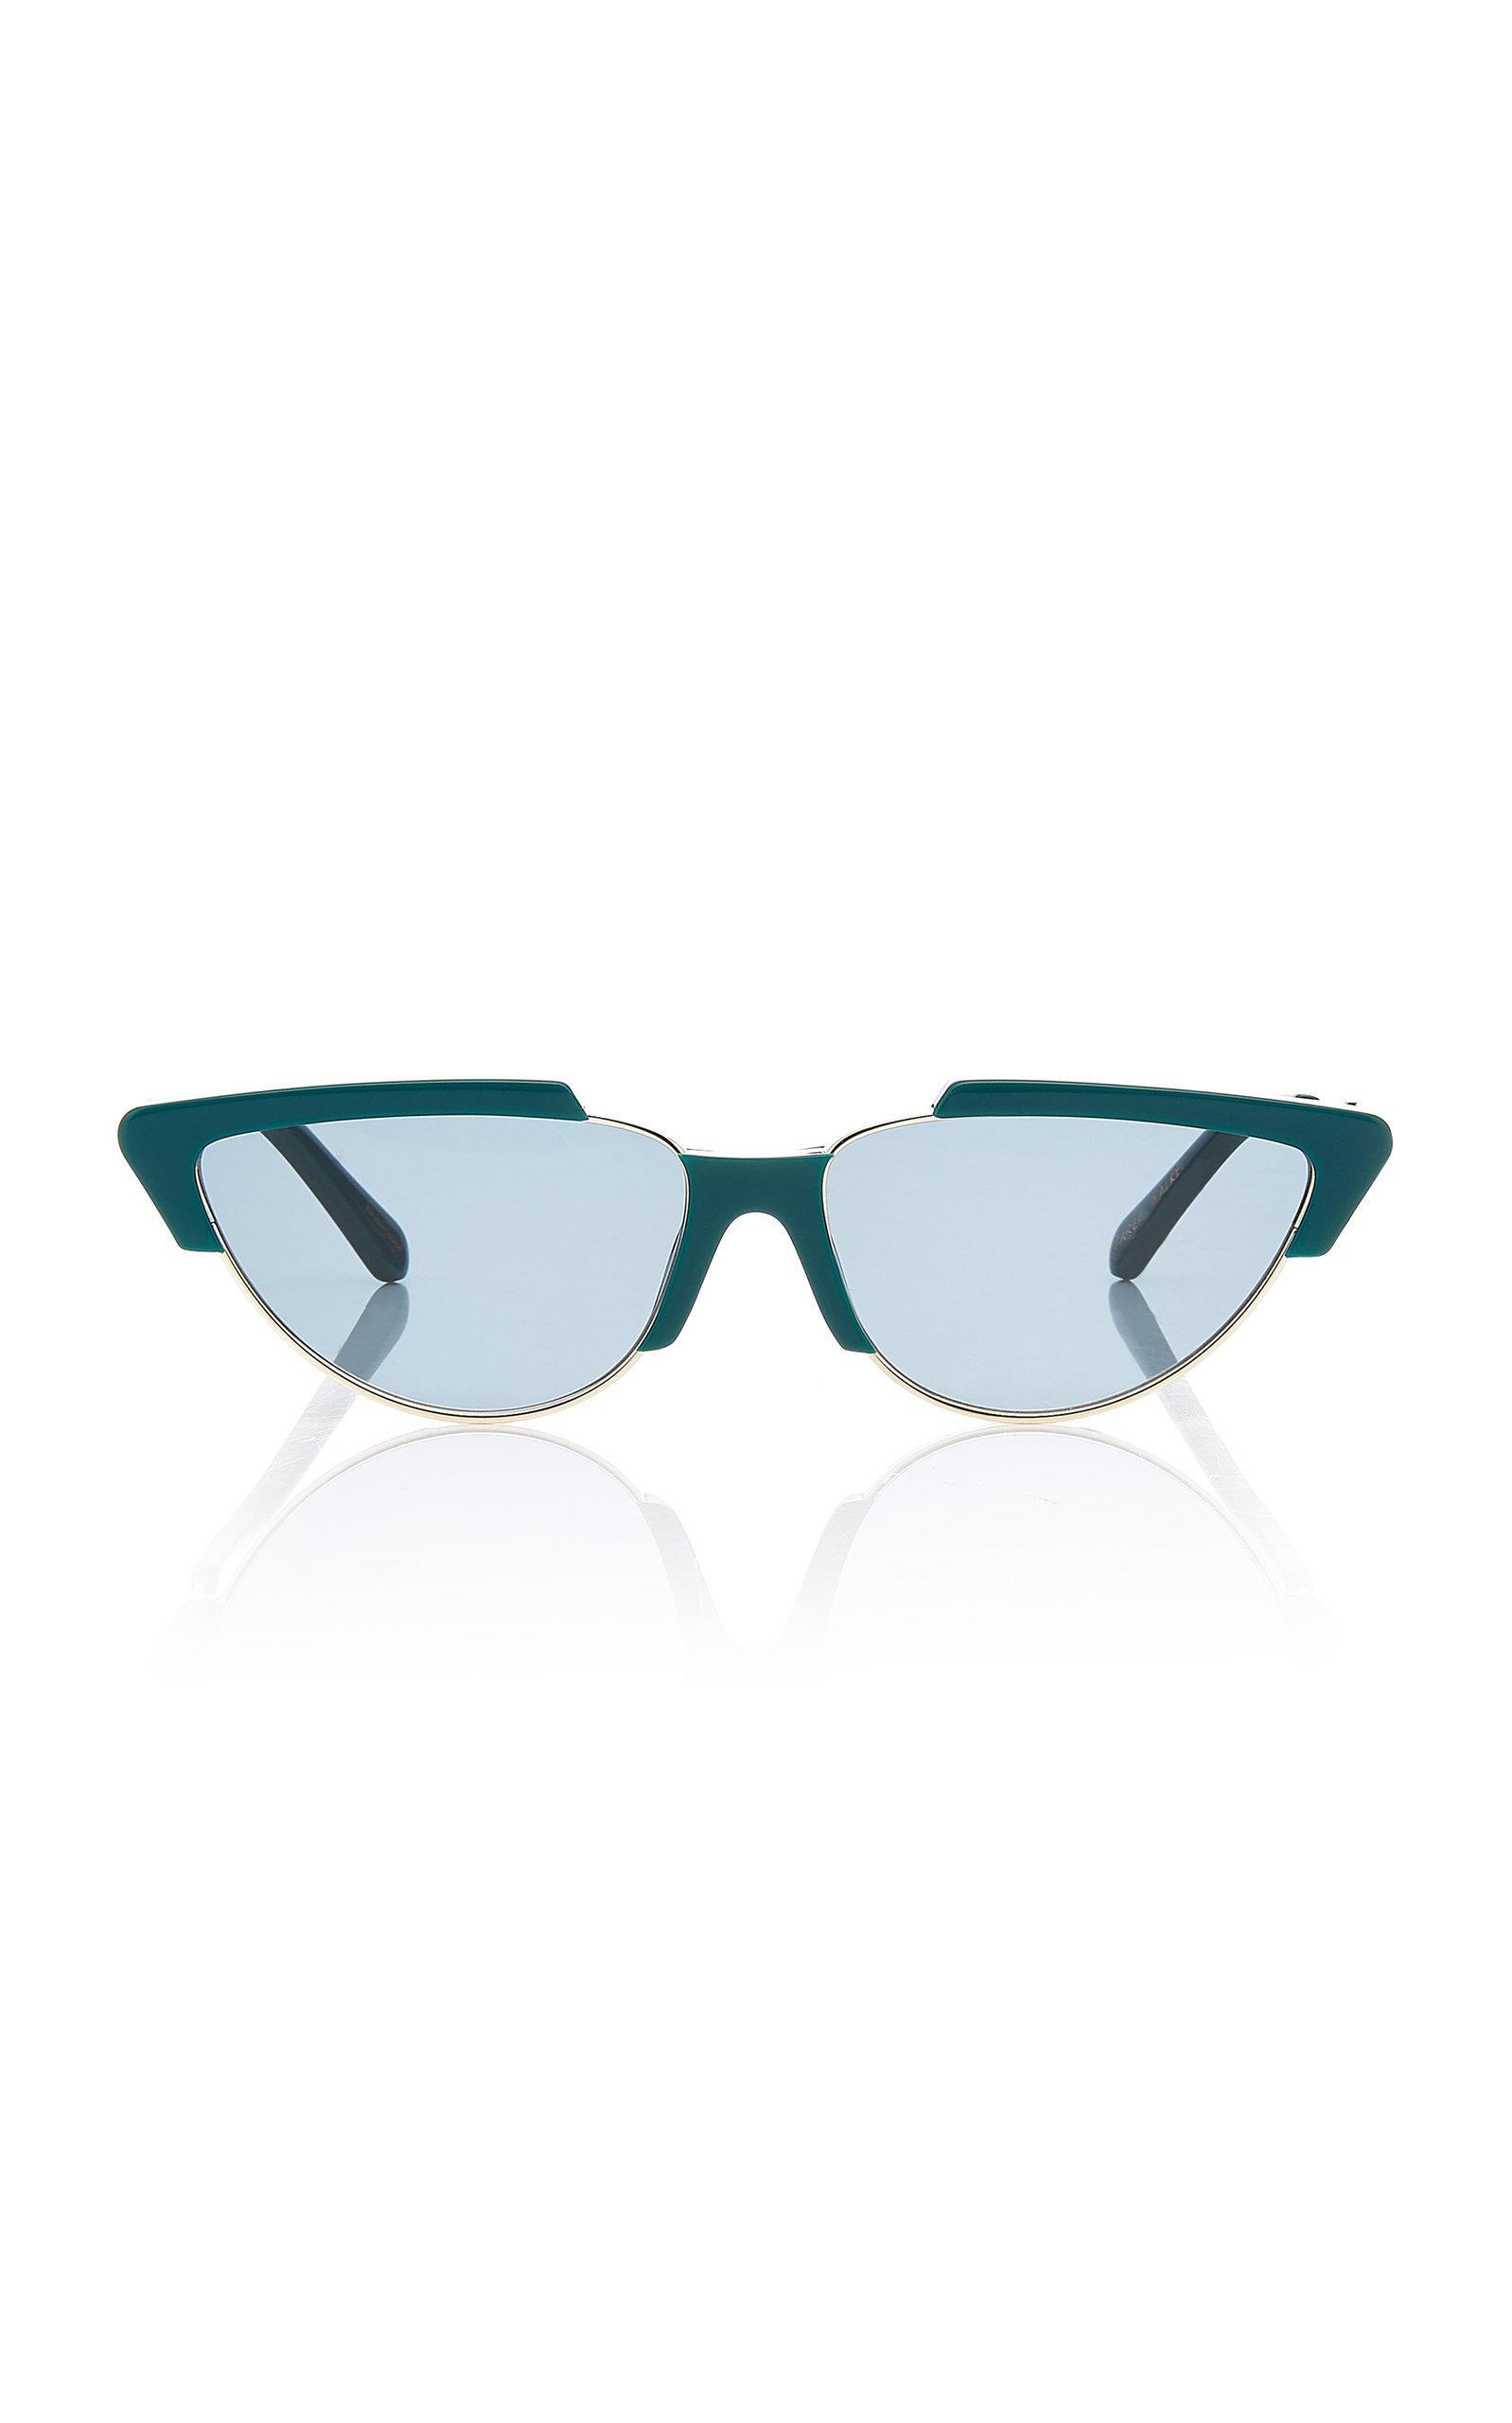 fb1009e9442e Karen Walker Tropics Cat Eye Acetate Sunglasses In Green | ModeSens